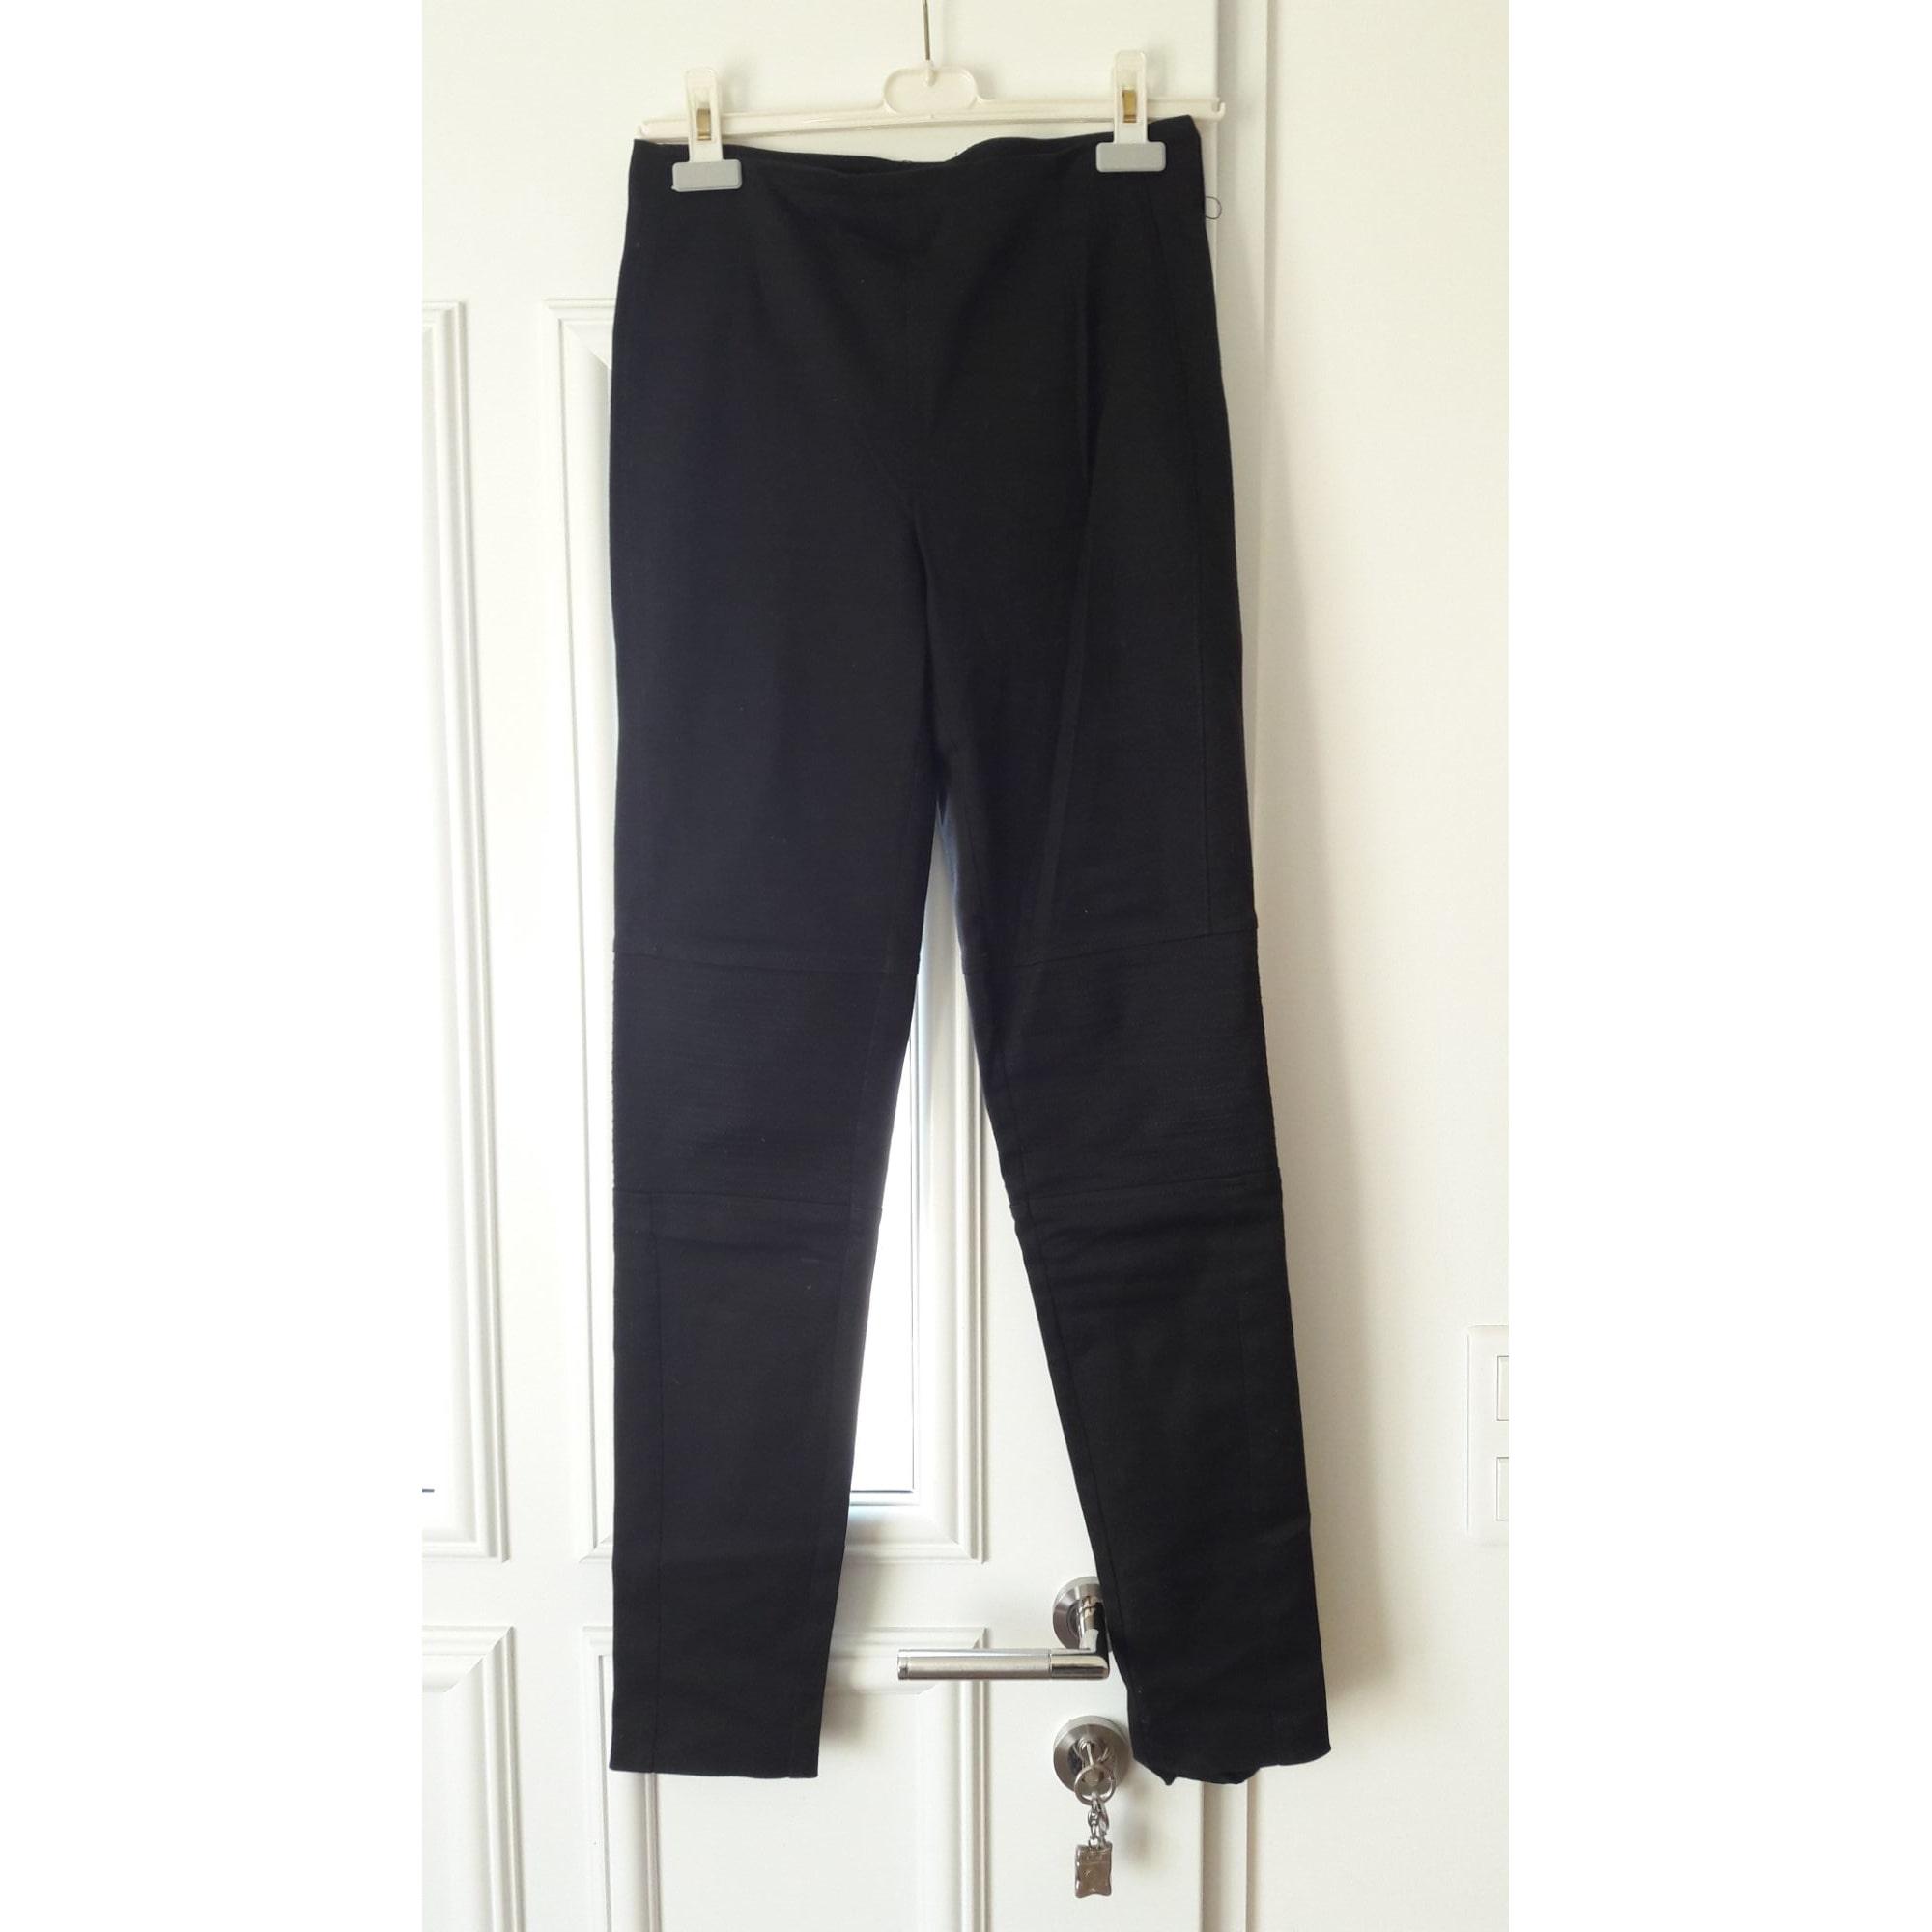 Pantalon slim, cigarette 1.2.3 Noir